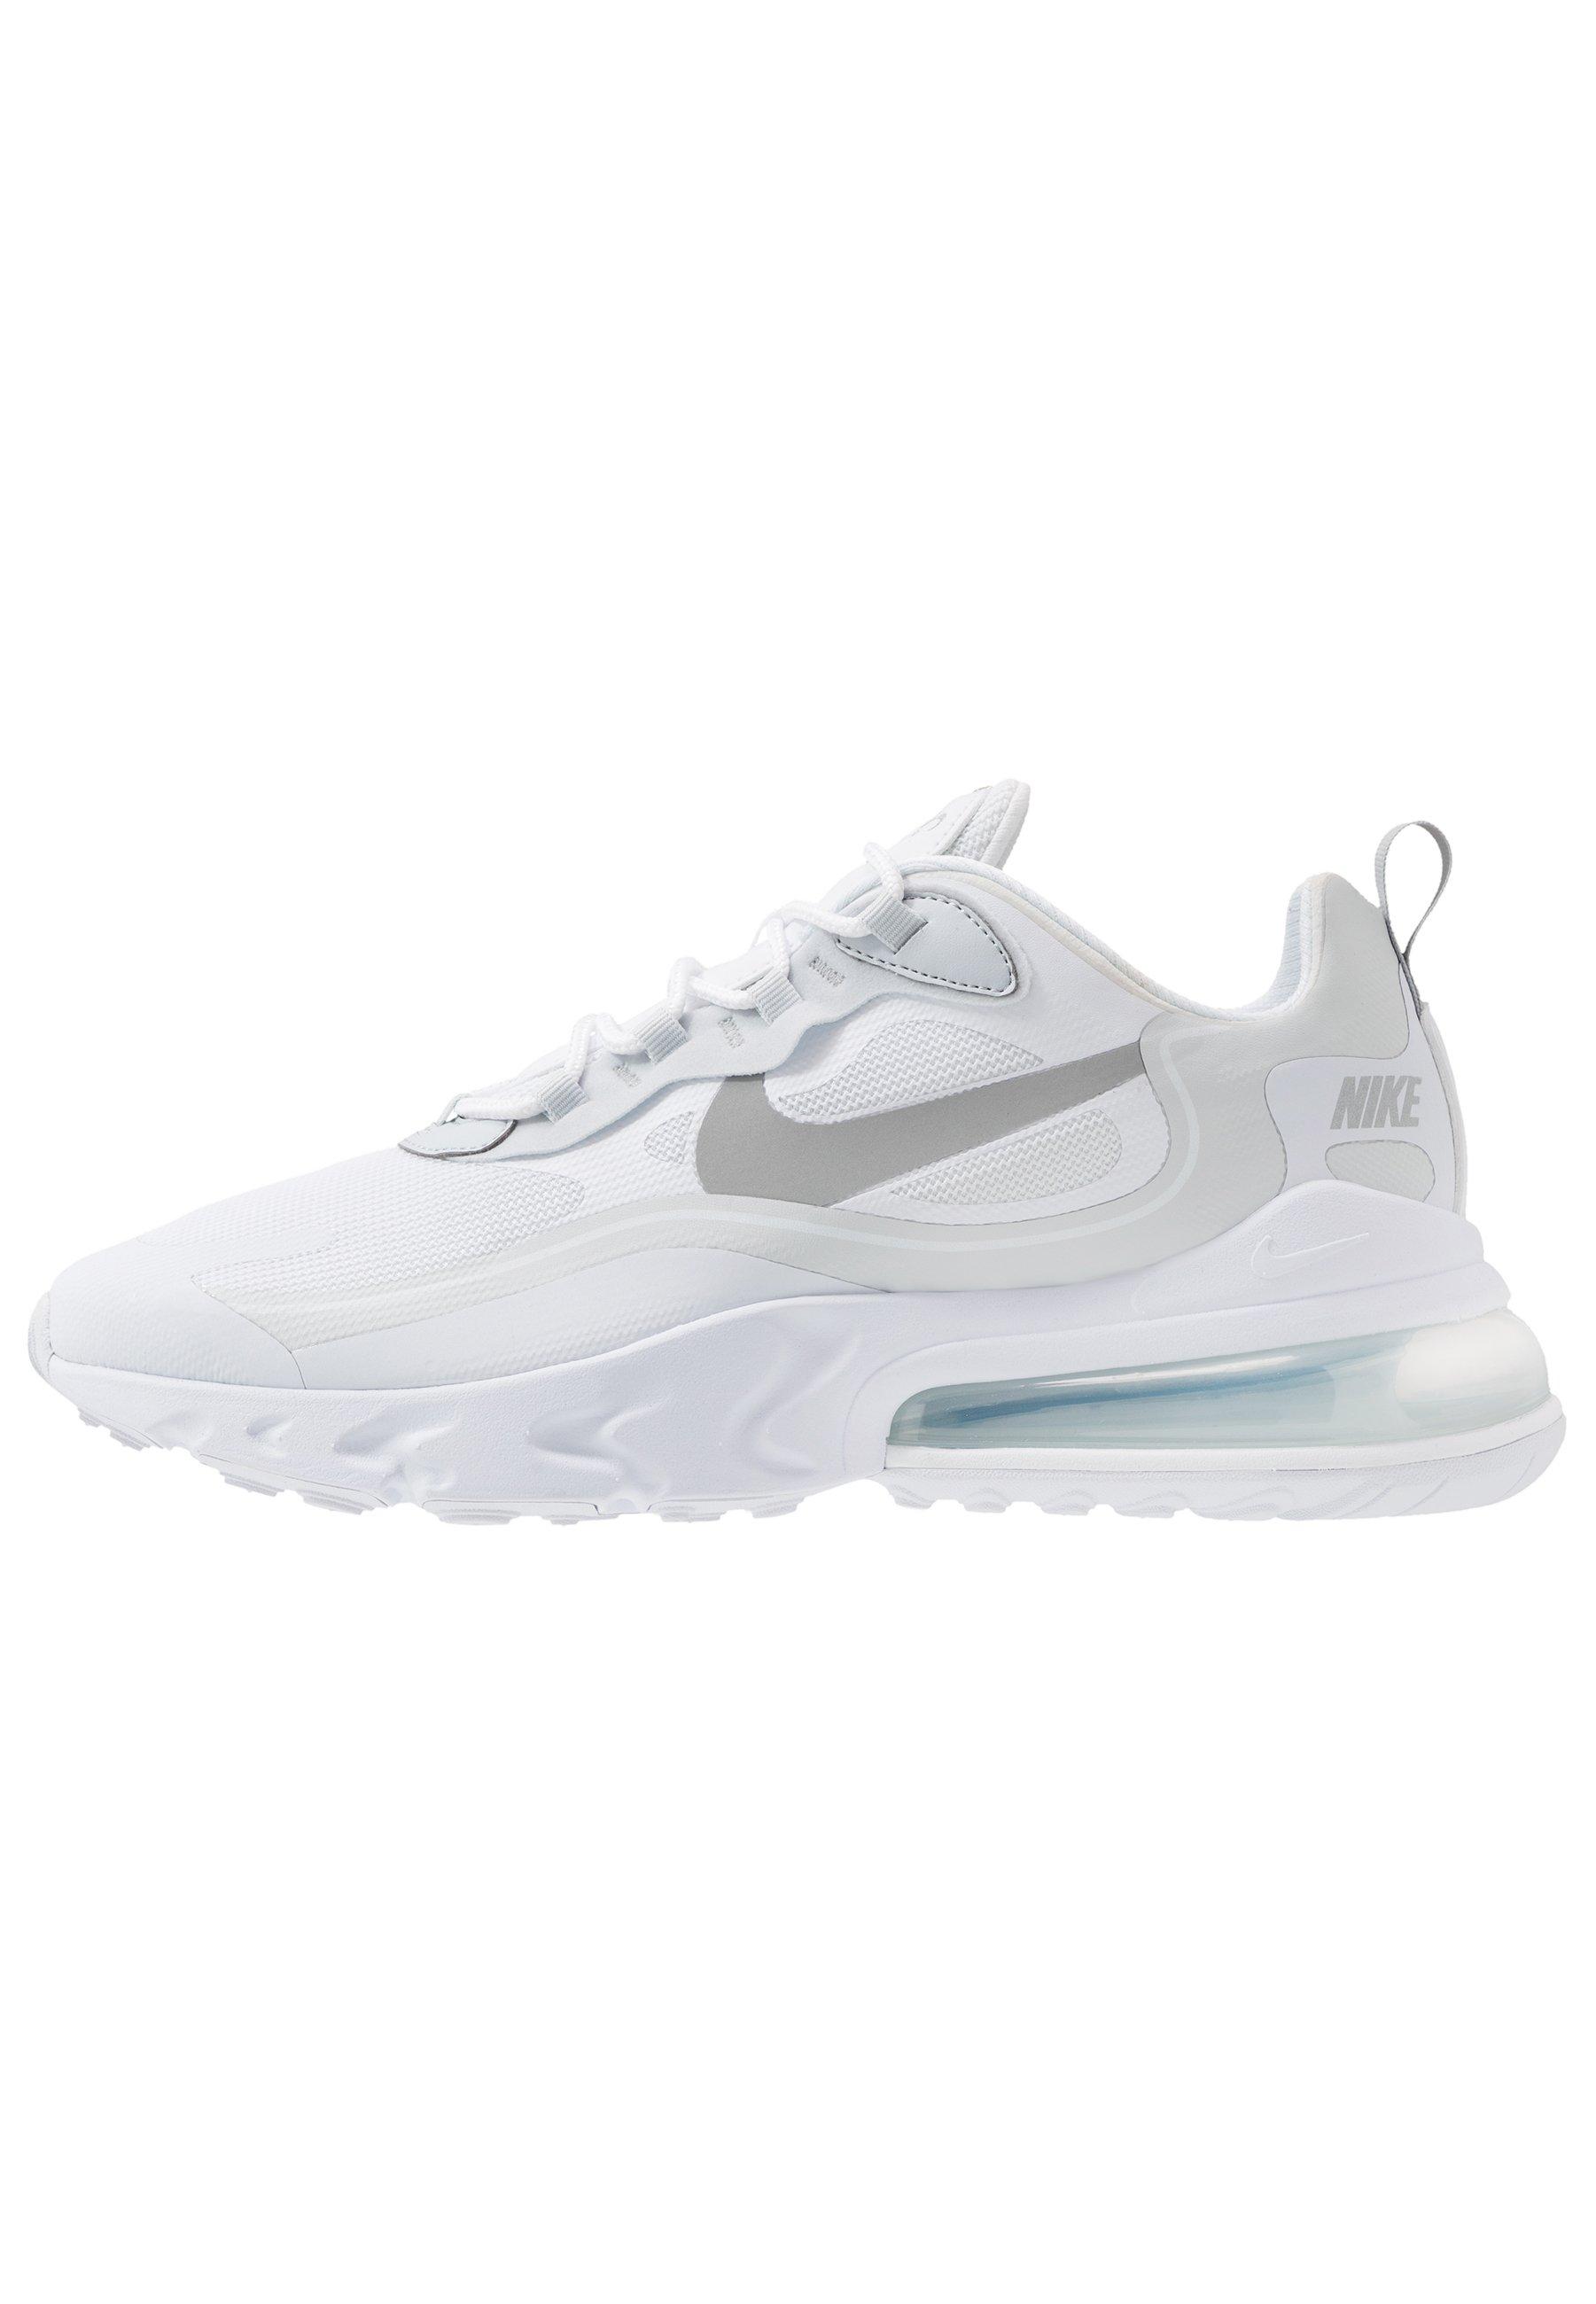 AIR MAX 270 REACT RVL Sneakers laag whitelight smoke greypure platinumcool grey